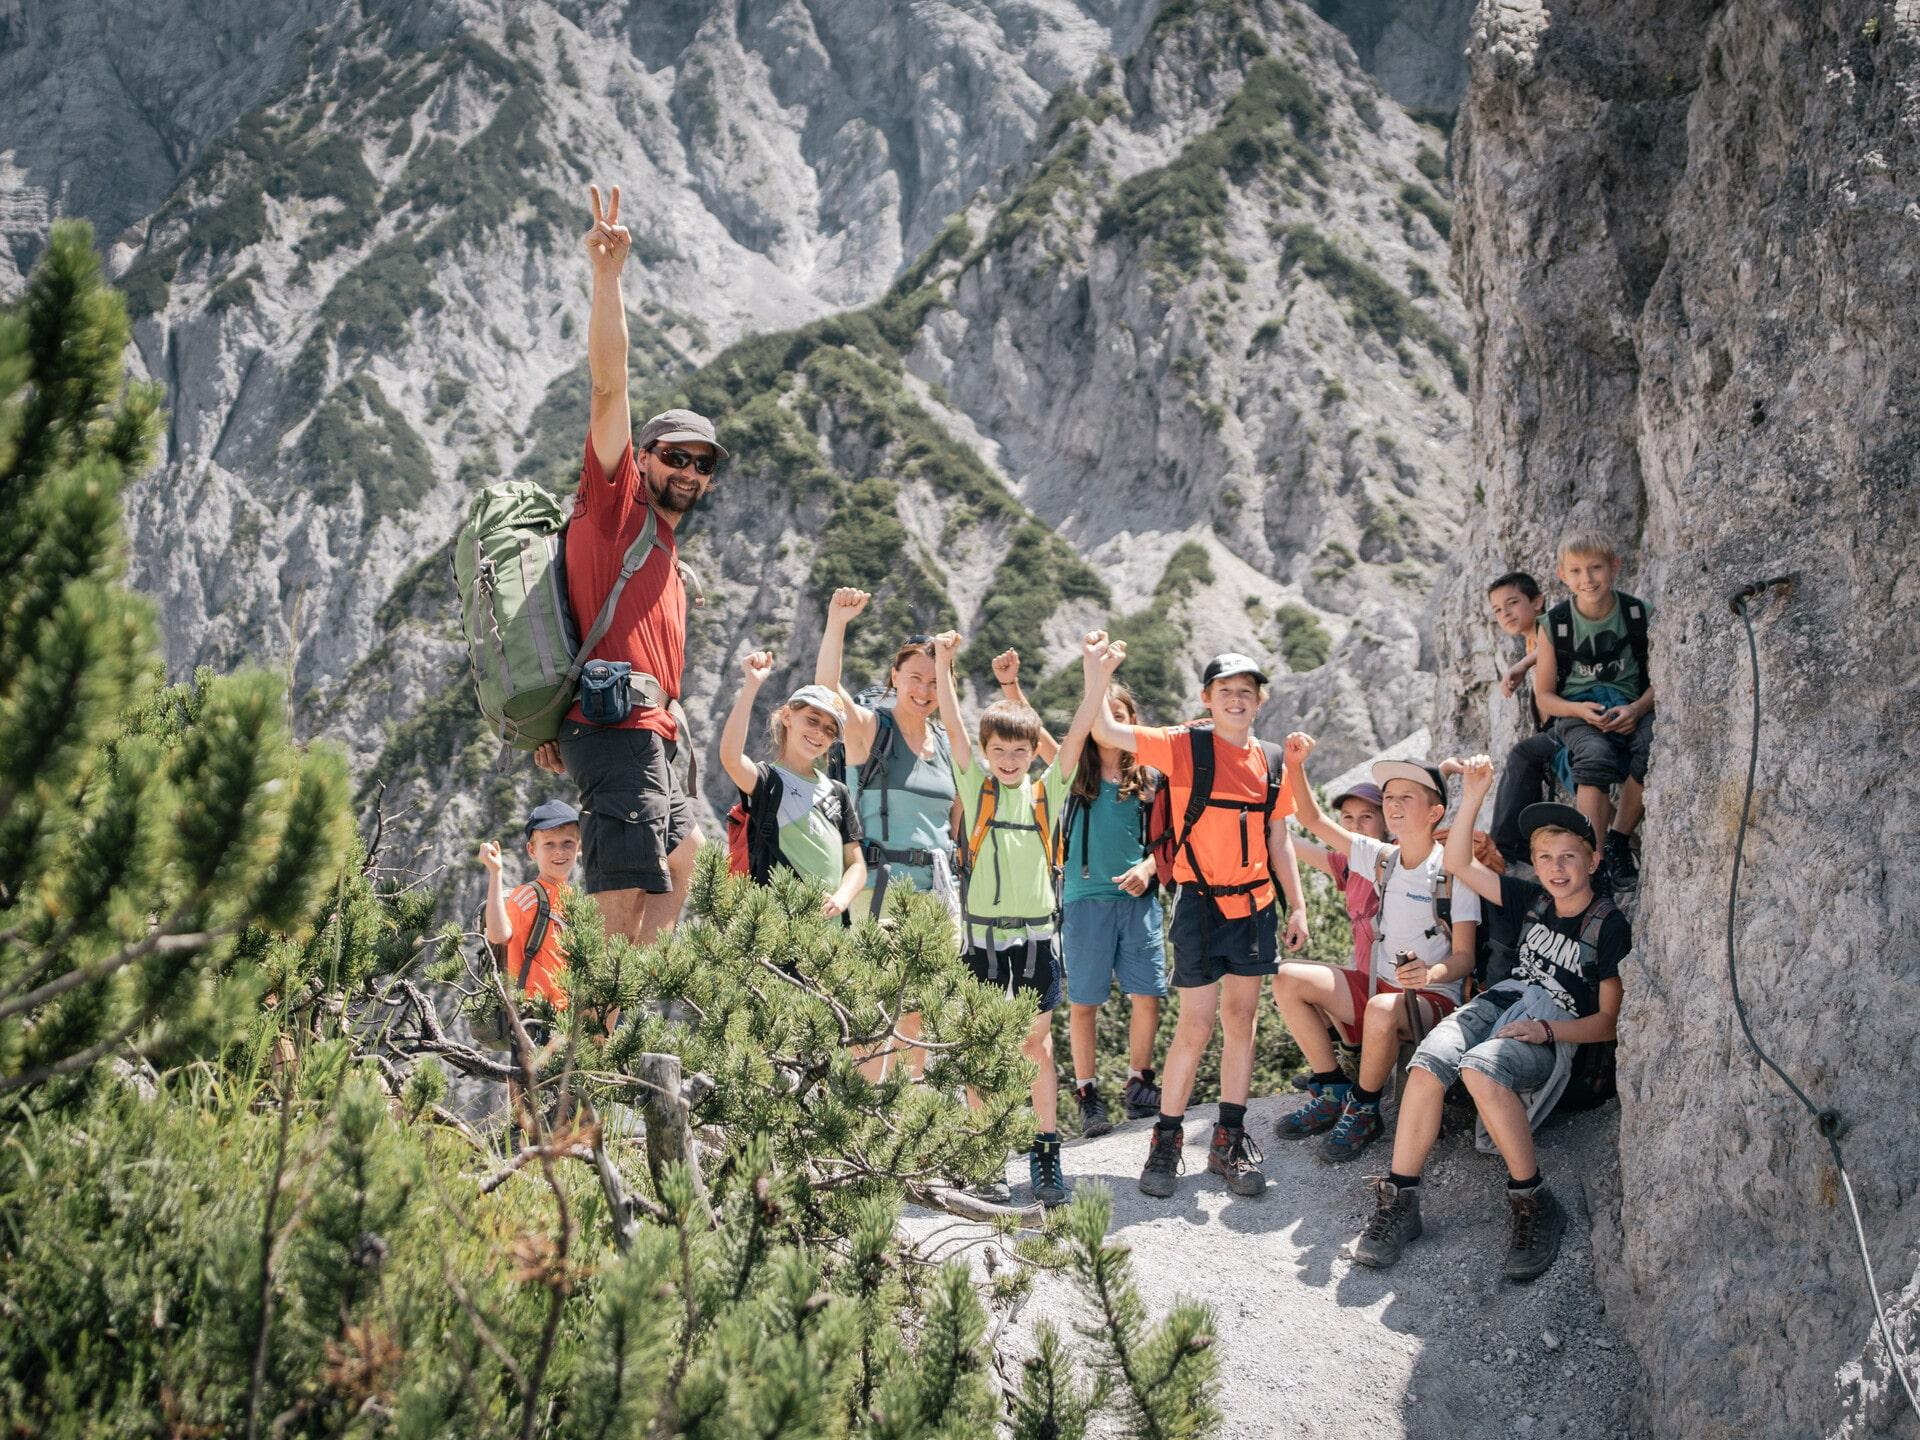 Nationalpark_Gesäuse_Youth_at_the_Top©StefanLeitner_com_022